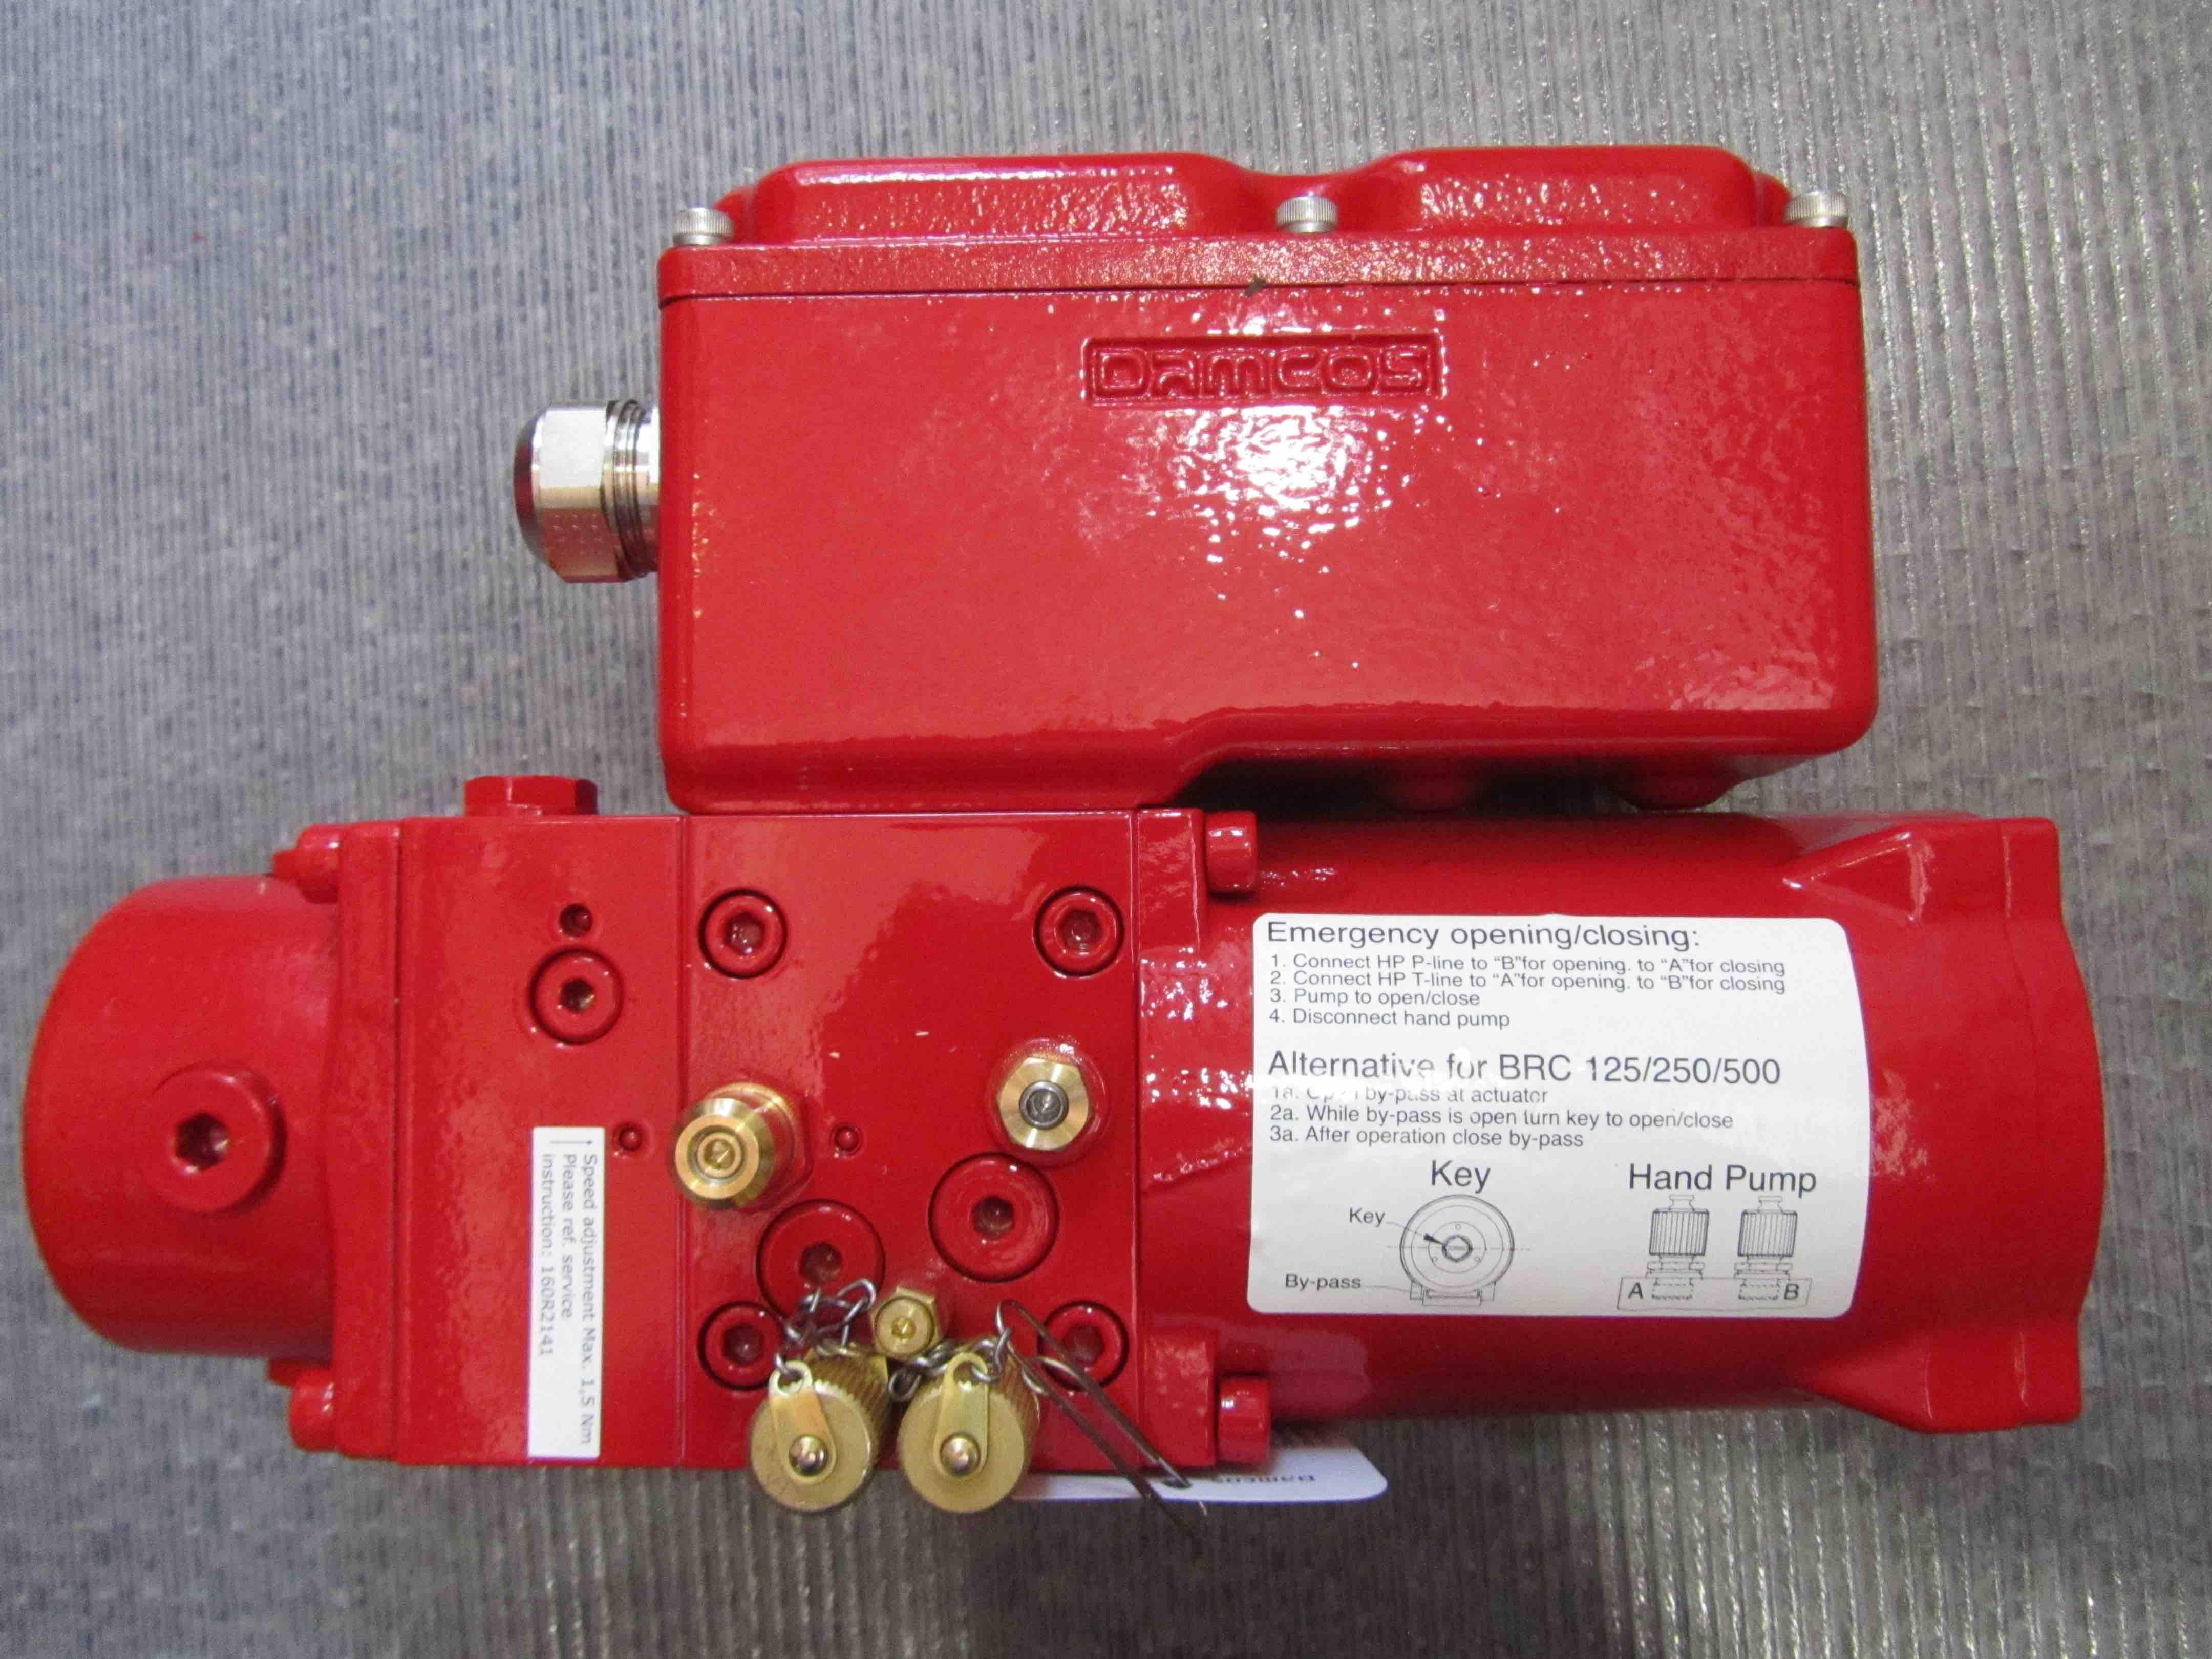 160G8004 LPU-D